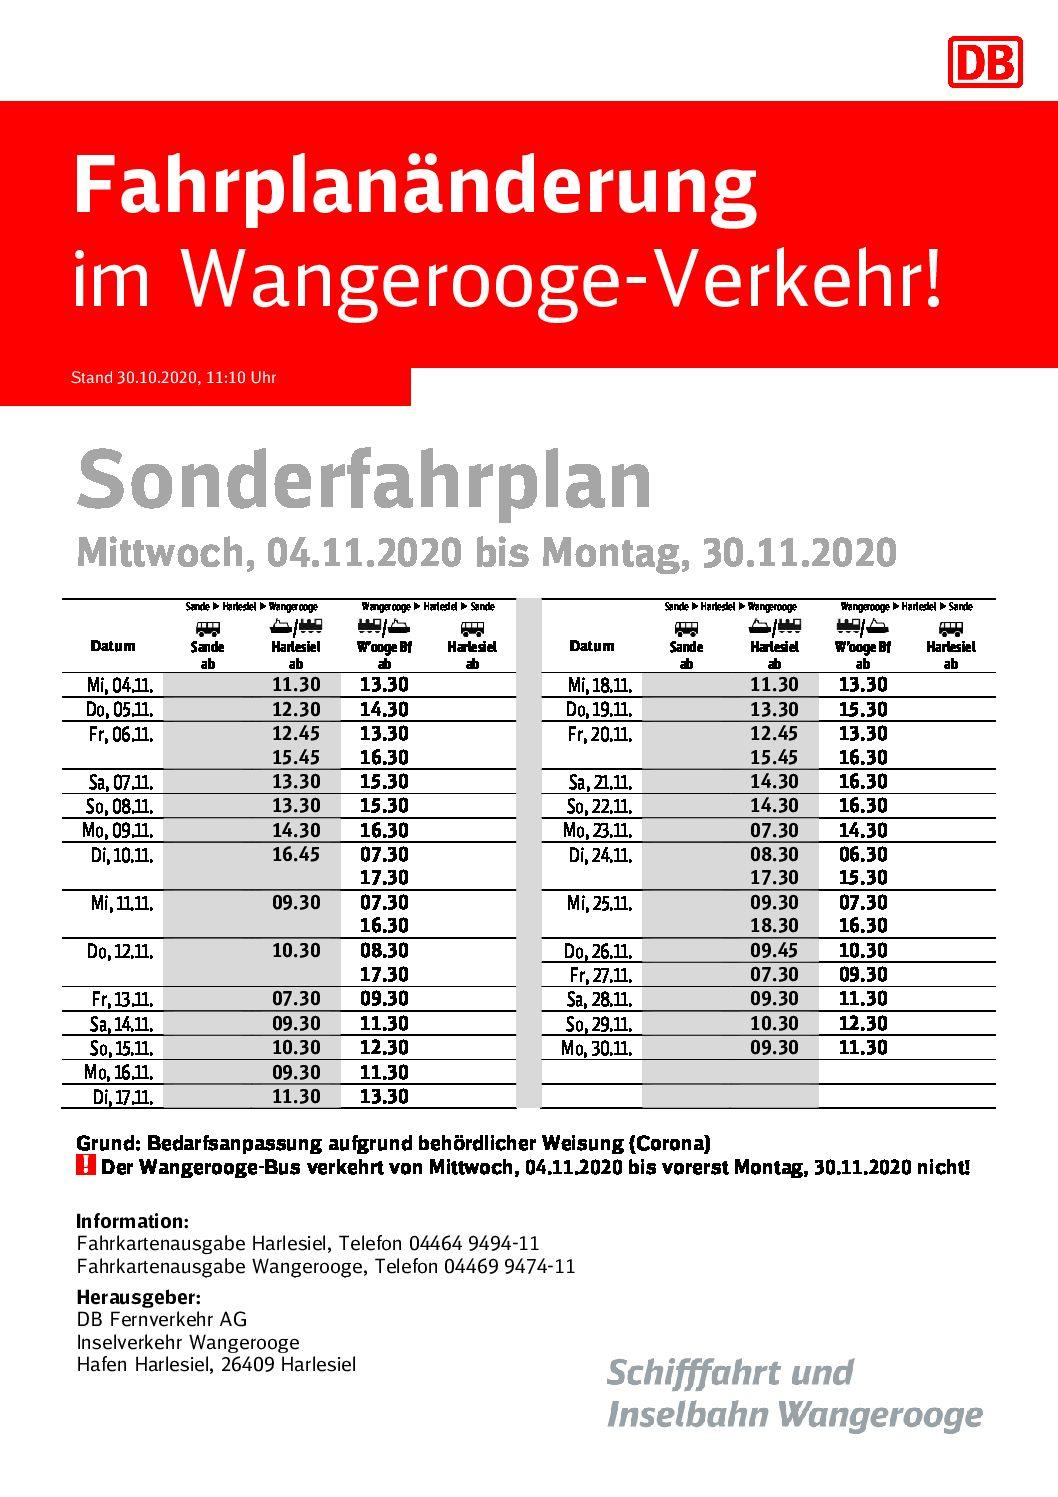 DB/SIW Fahrplanänderung 04.-30.11.2020